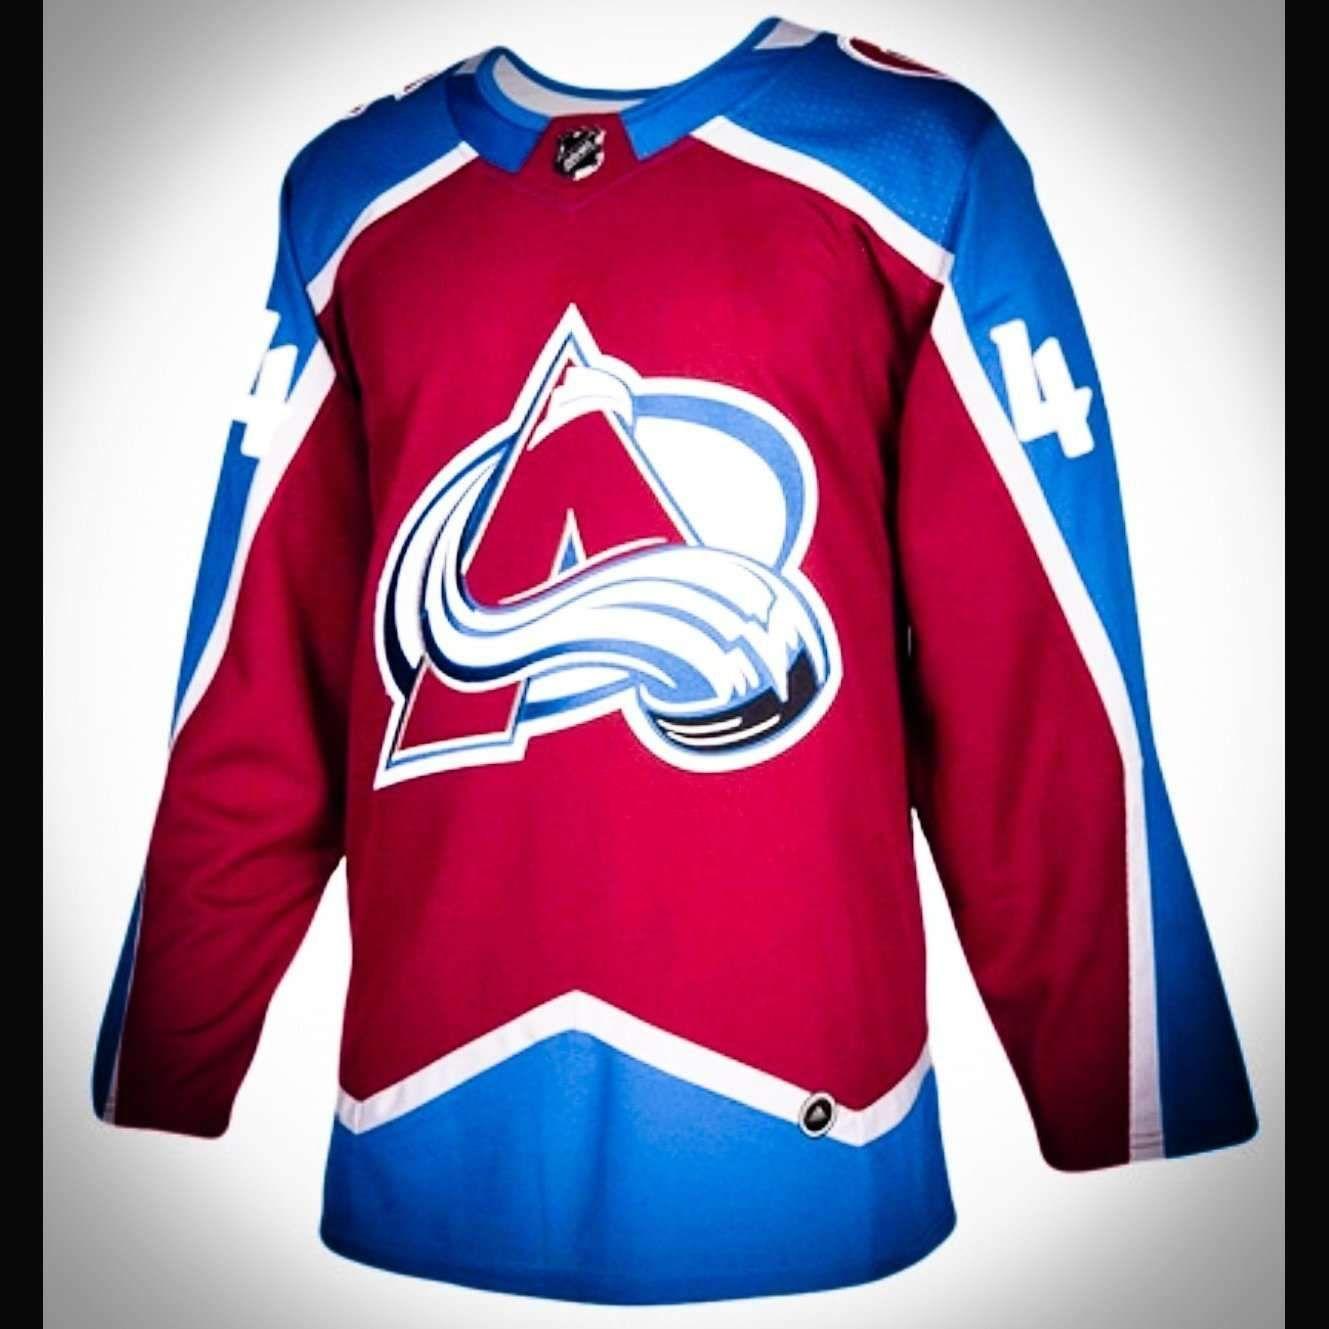 free shipping 364ad 6291f Colorado Avalanche Premier Adidas NHL Home - Road & Alt ...